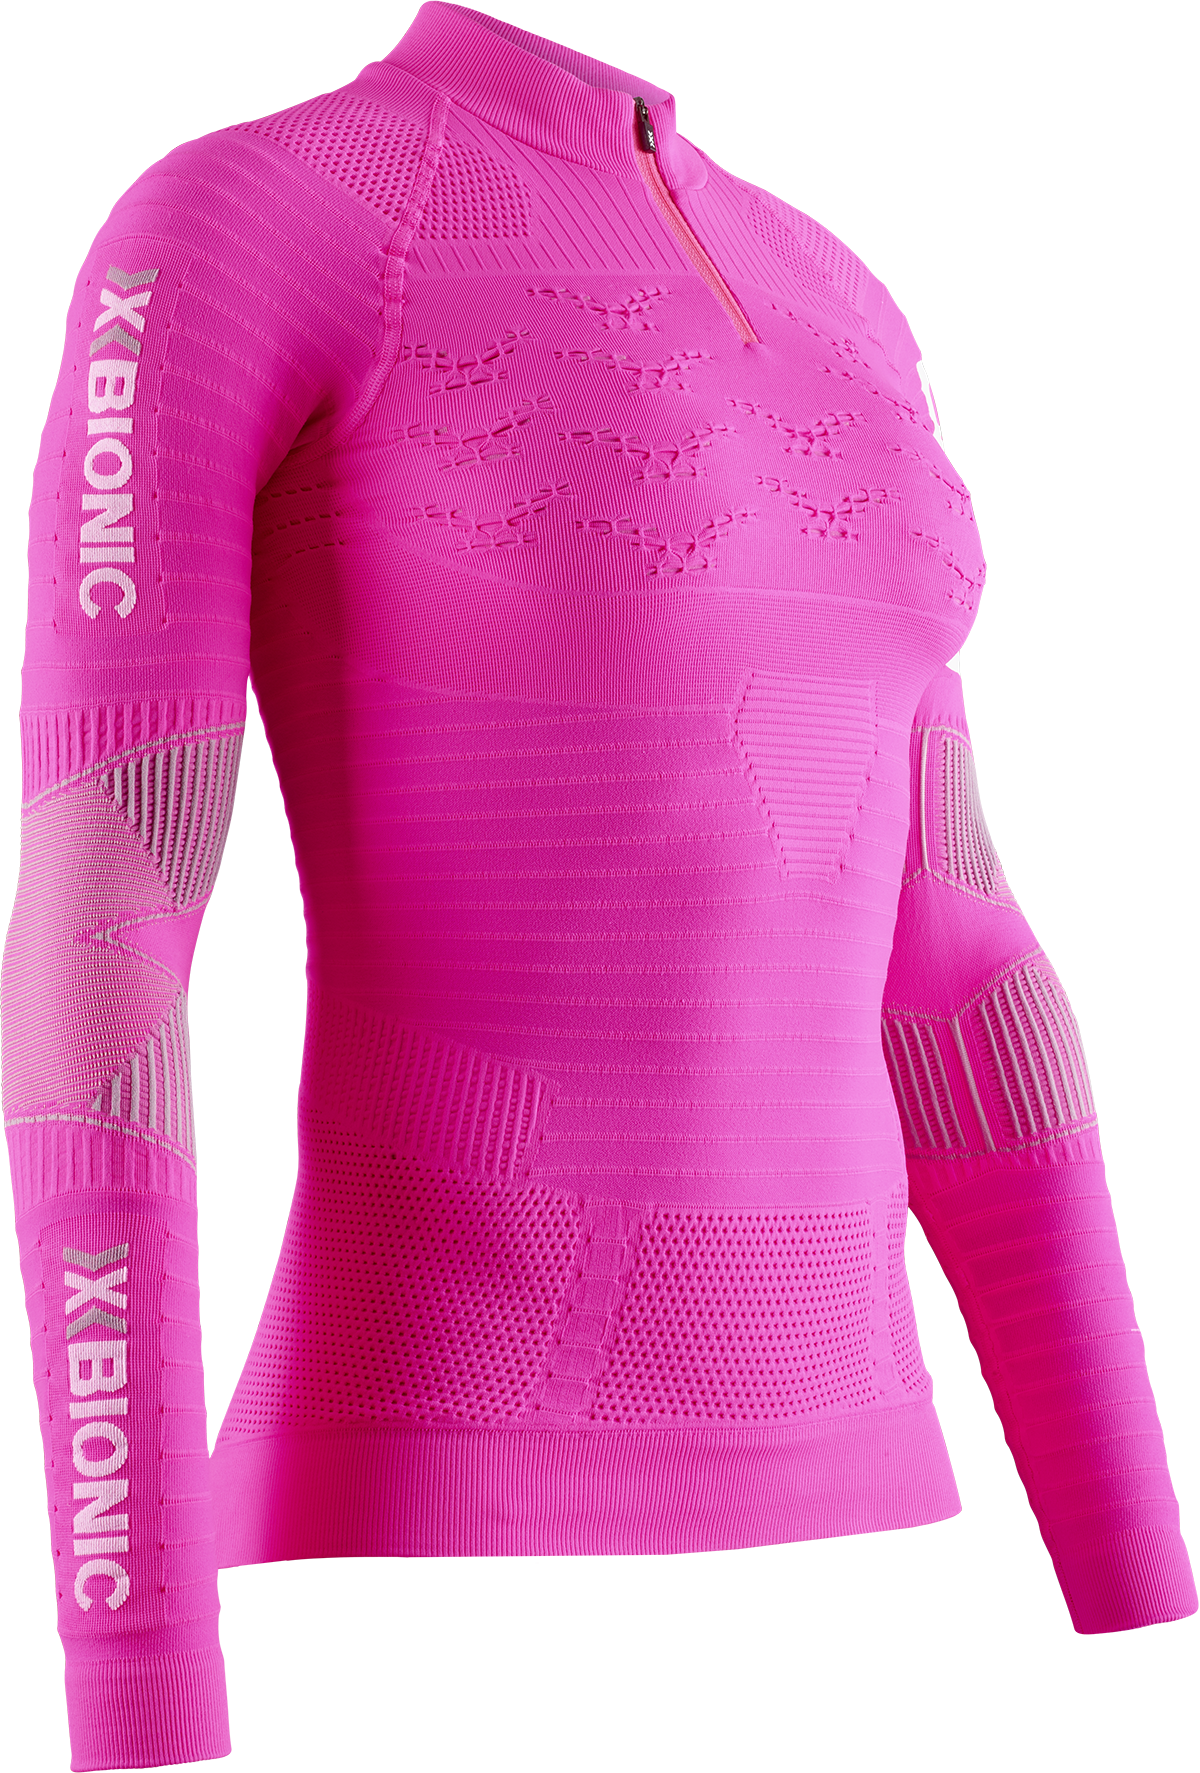 Short Donna Effektor Tuqoise//Arctic White X-Bionic 4.0 Run Shorts Women XS